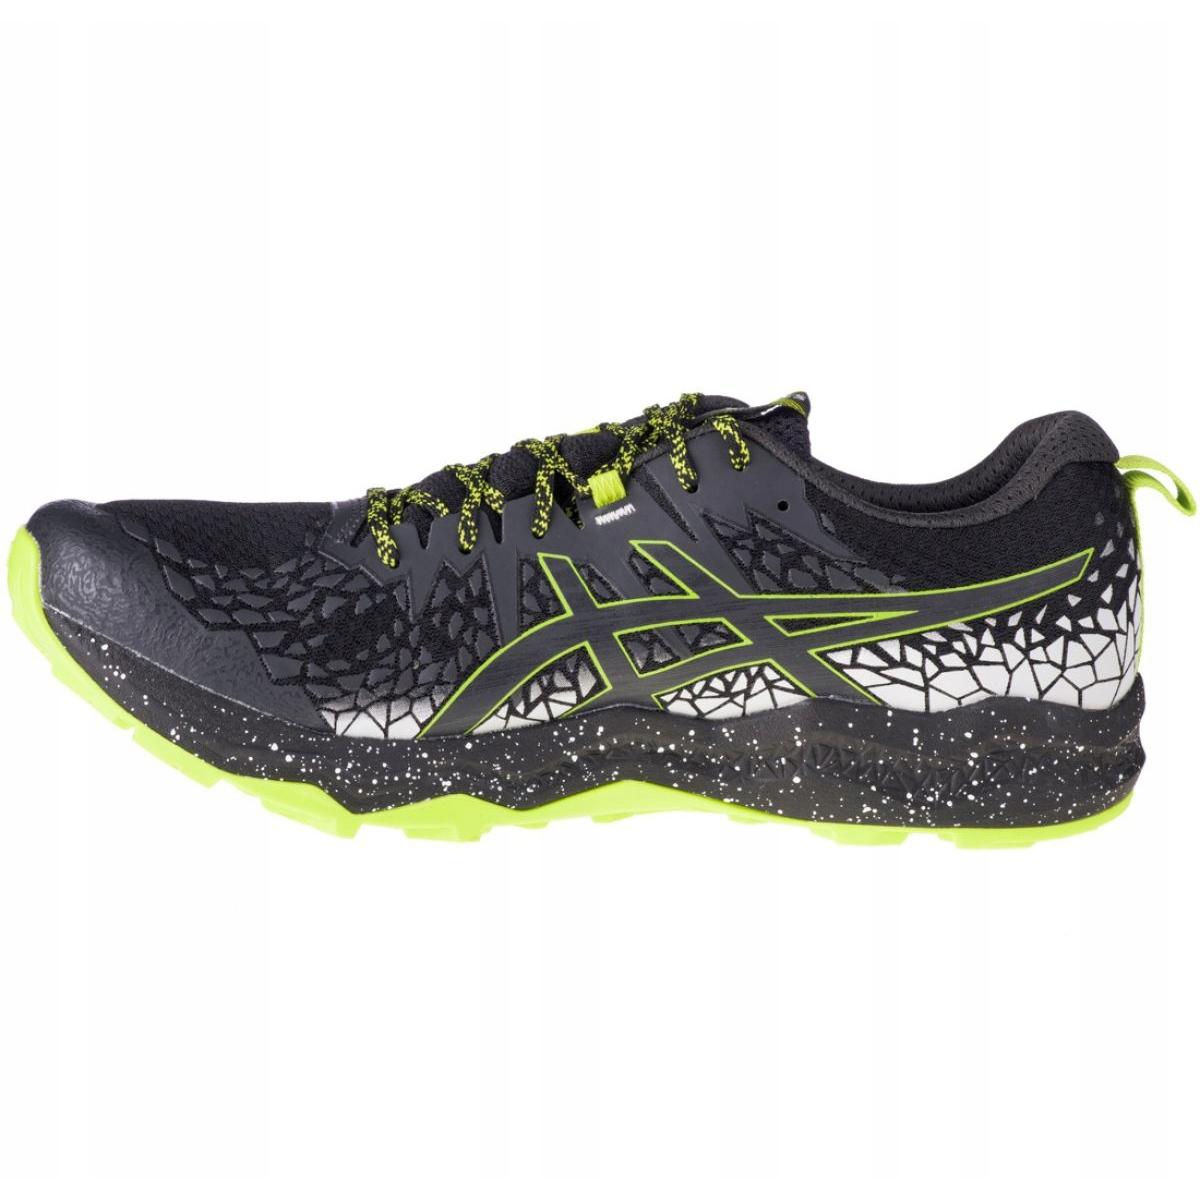 Asics FujiTrabuco Lyte M 1011A700-001 shoes black - KeeShoes